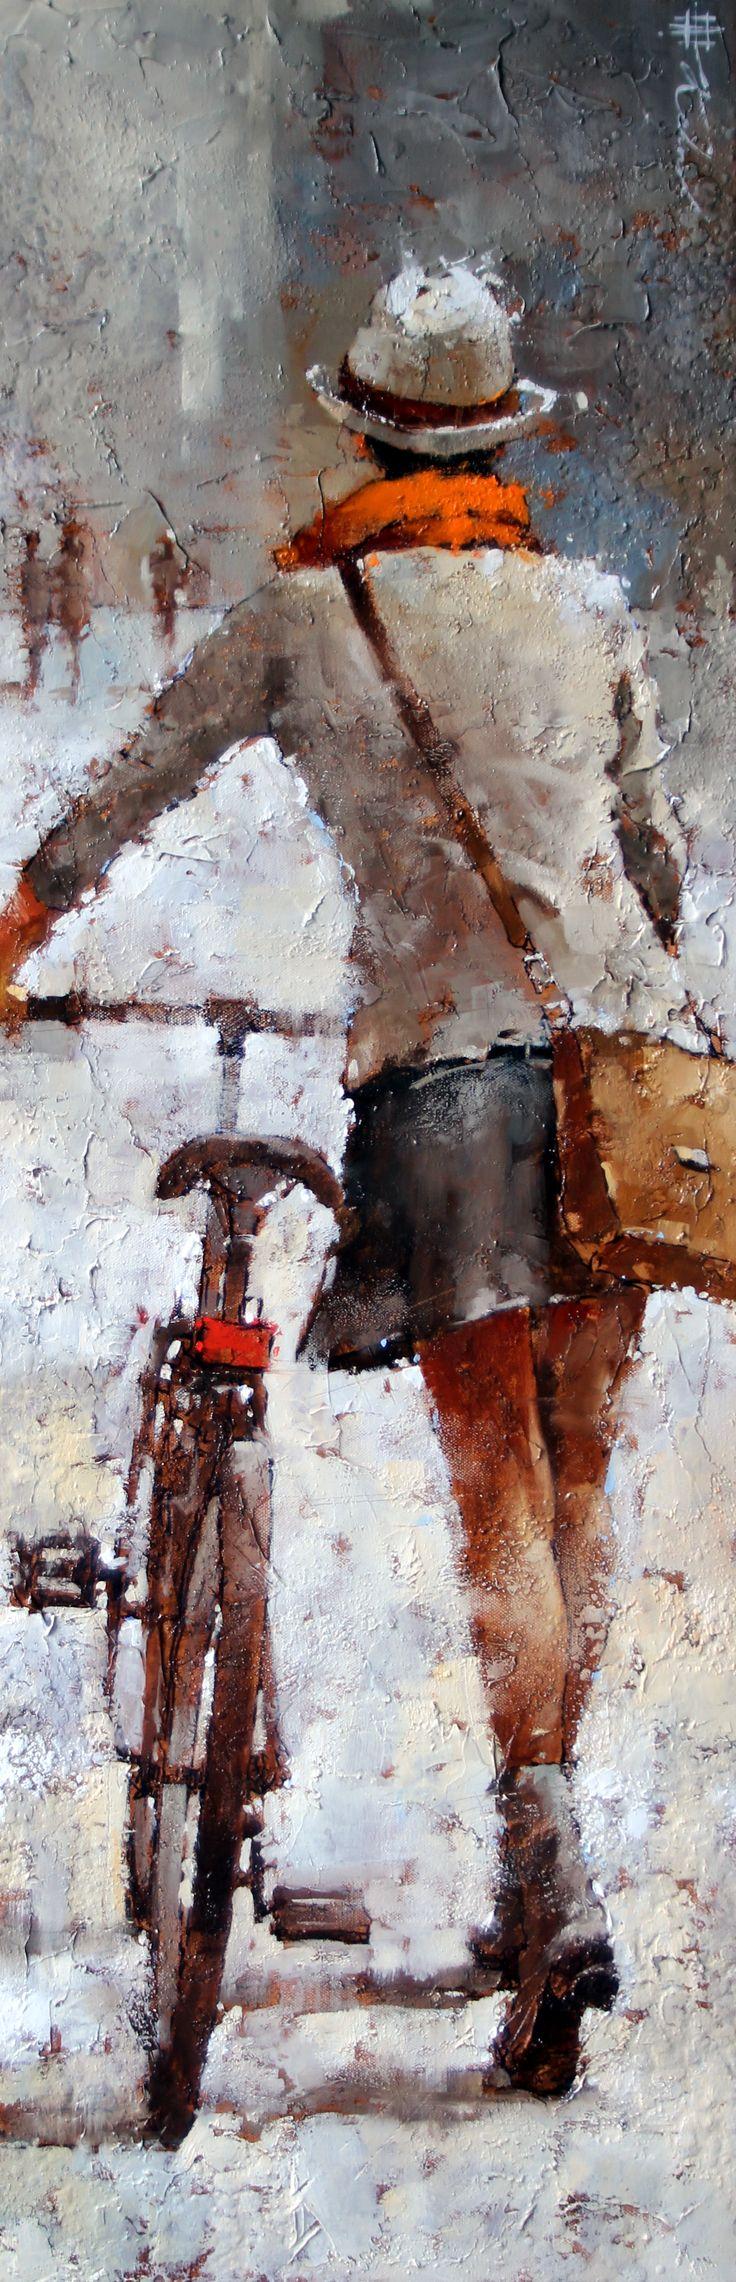 Galleries in Carmel and Palm Desert California - Jones & Terwilliger Galleries -Andre John  (Love This)